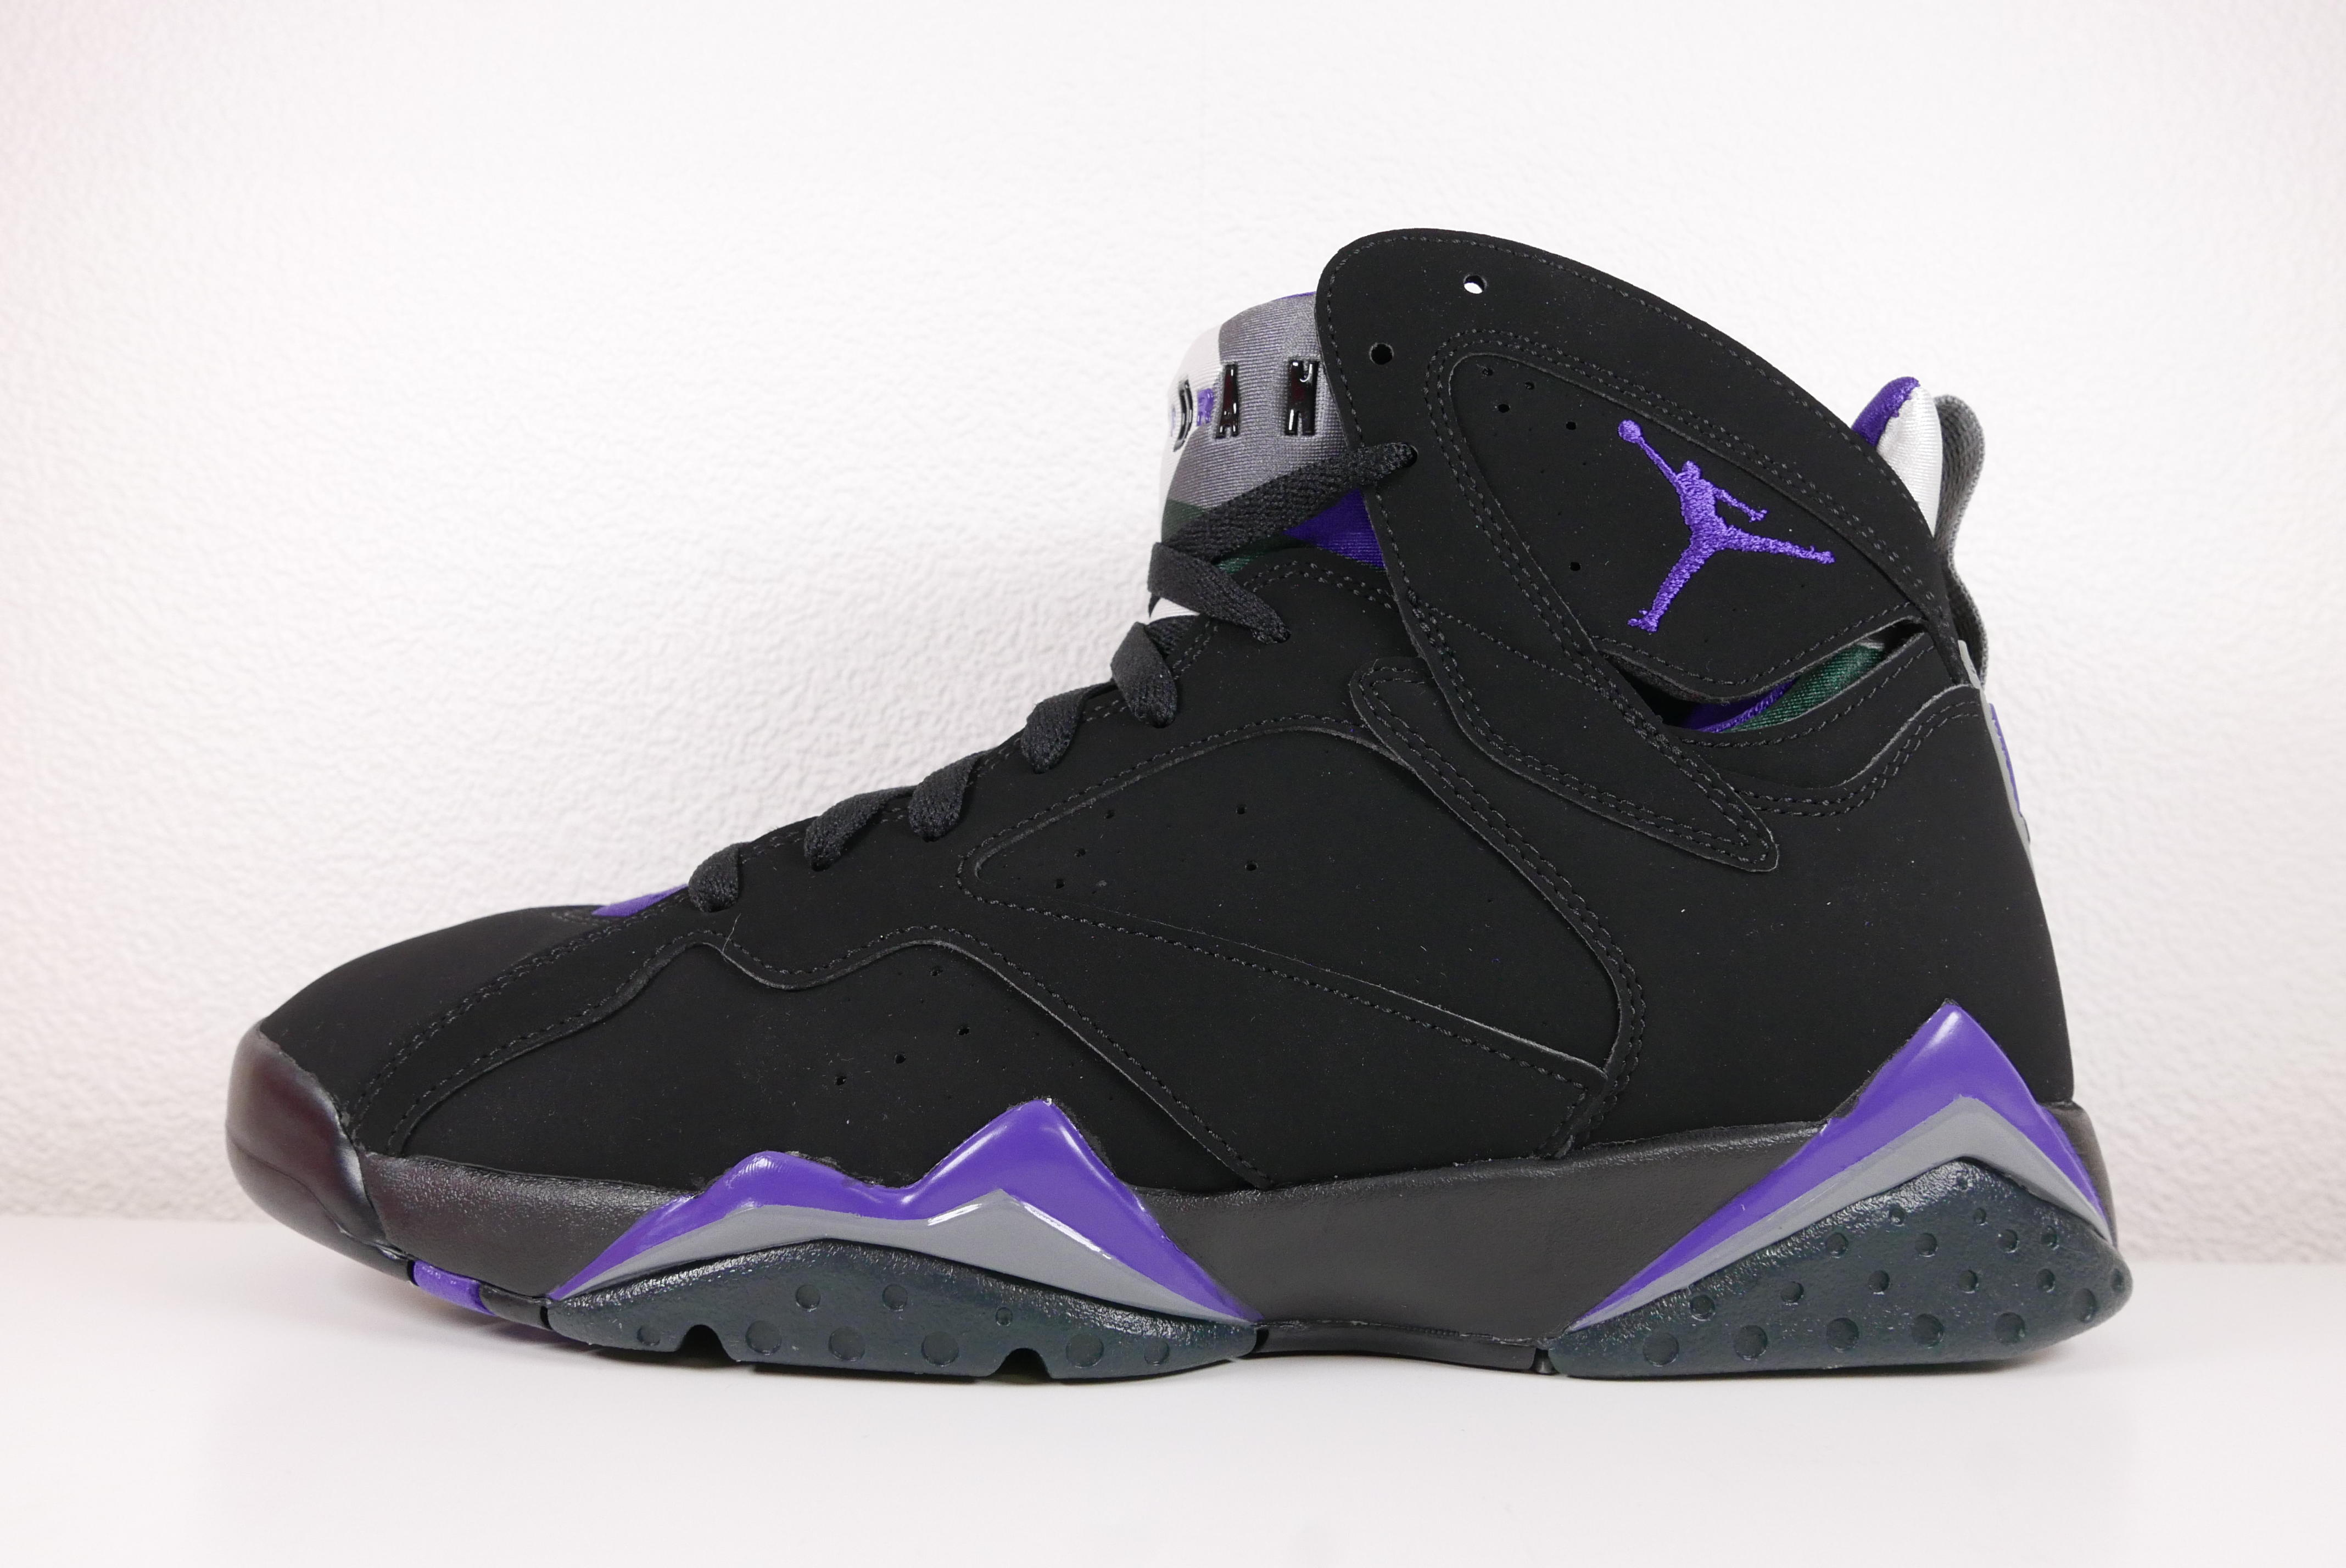 Nike Air Jordan 1 Retro High Og Mens Basketball Trainers 555088 Sneakers 401 Other